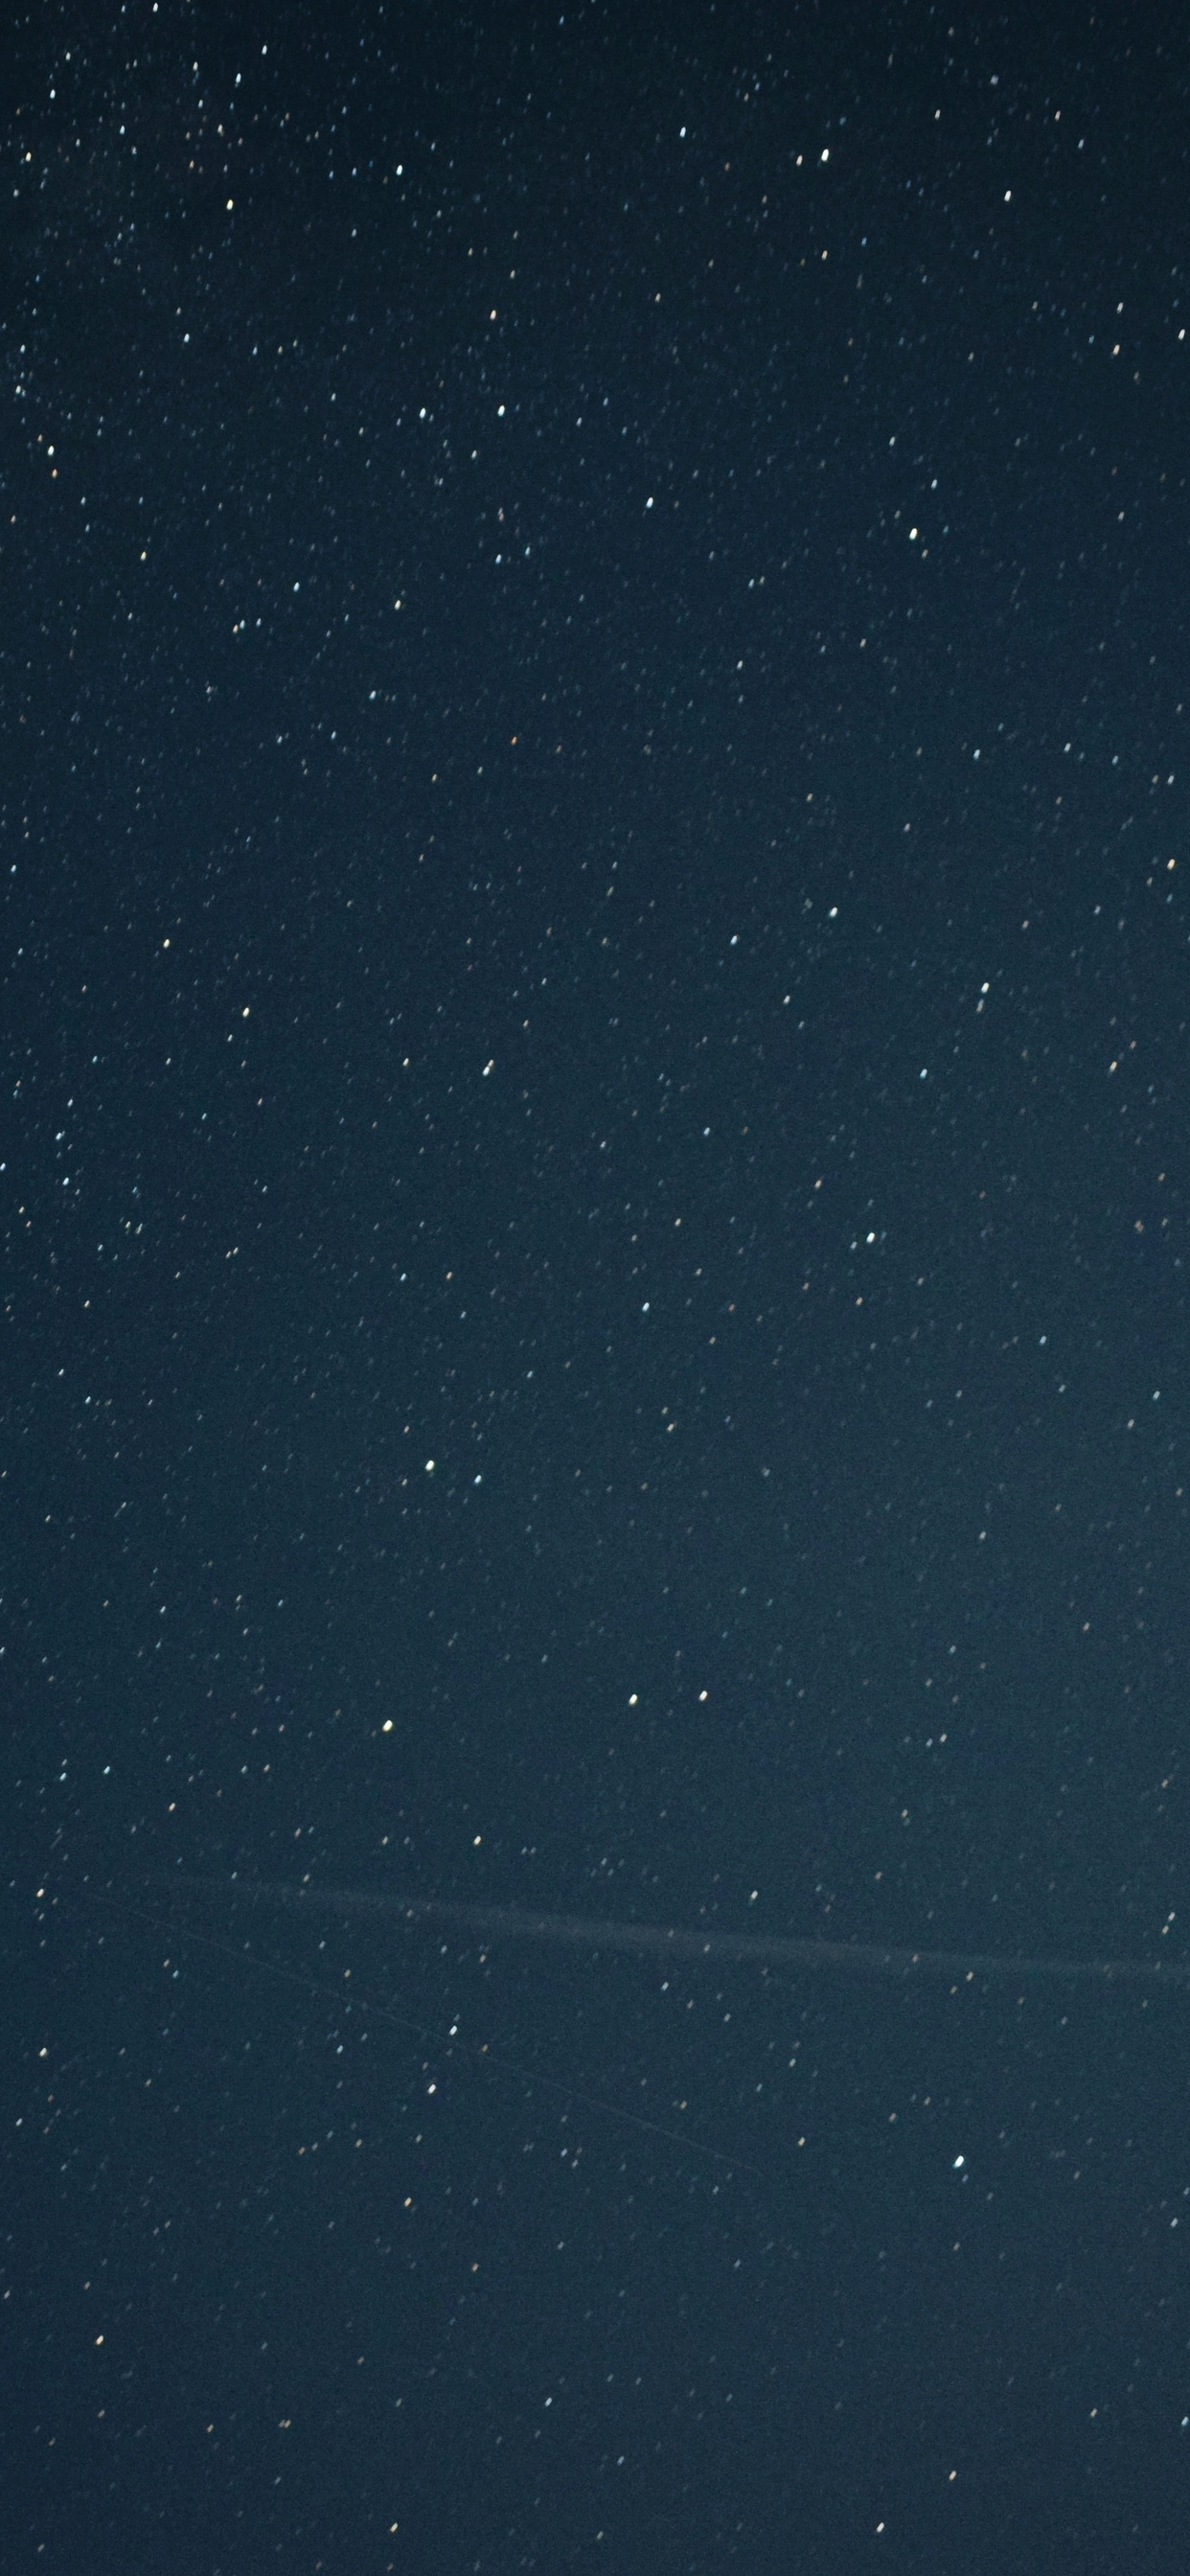 New Wallpaper Sky Night Iphone - wallpaper